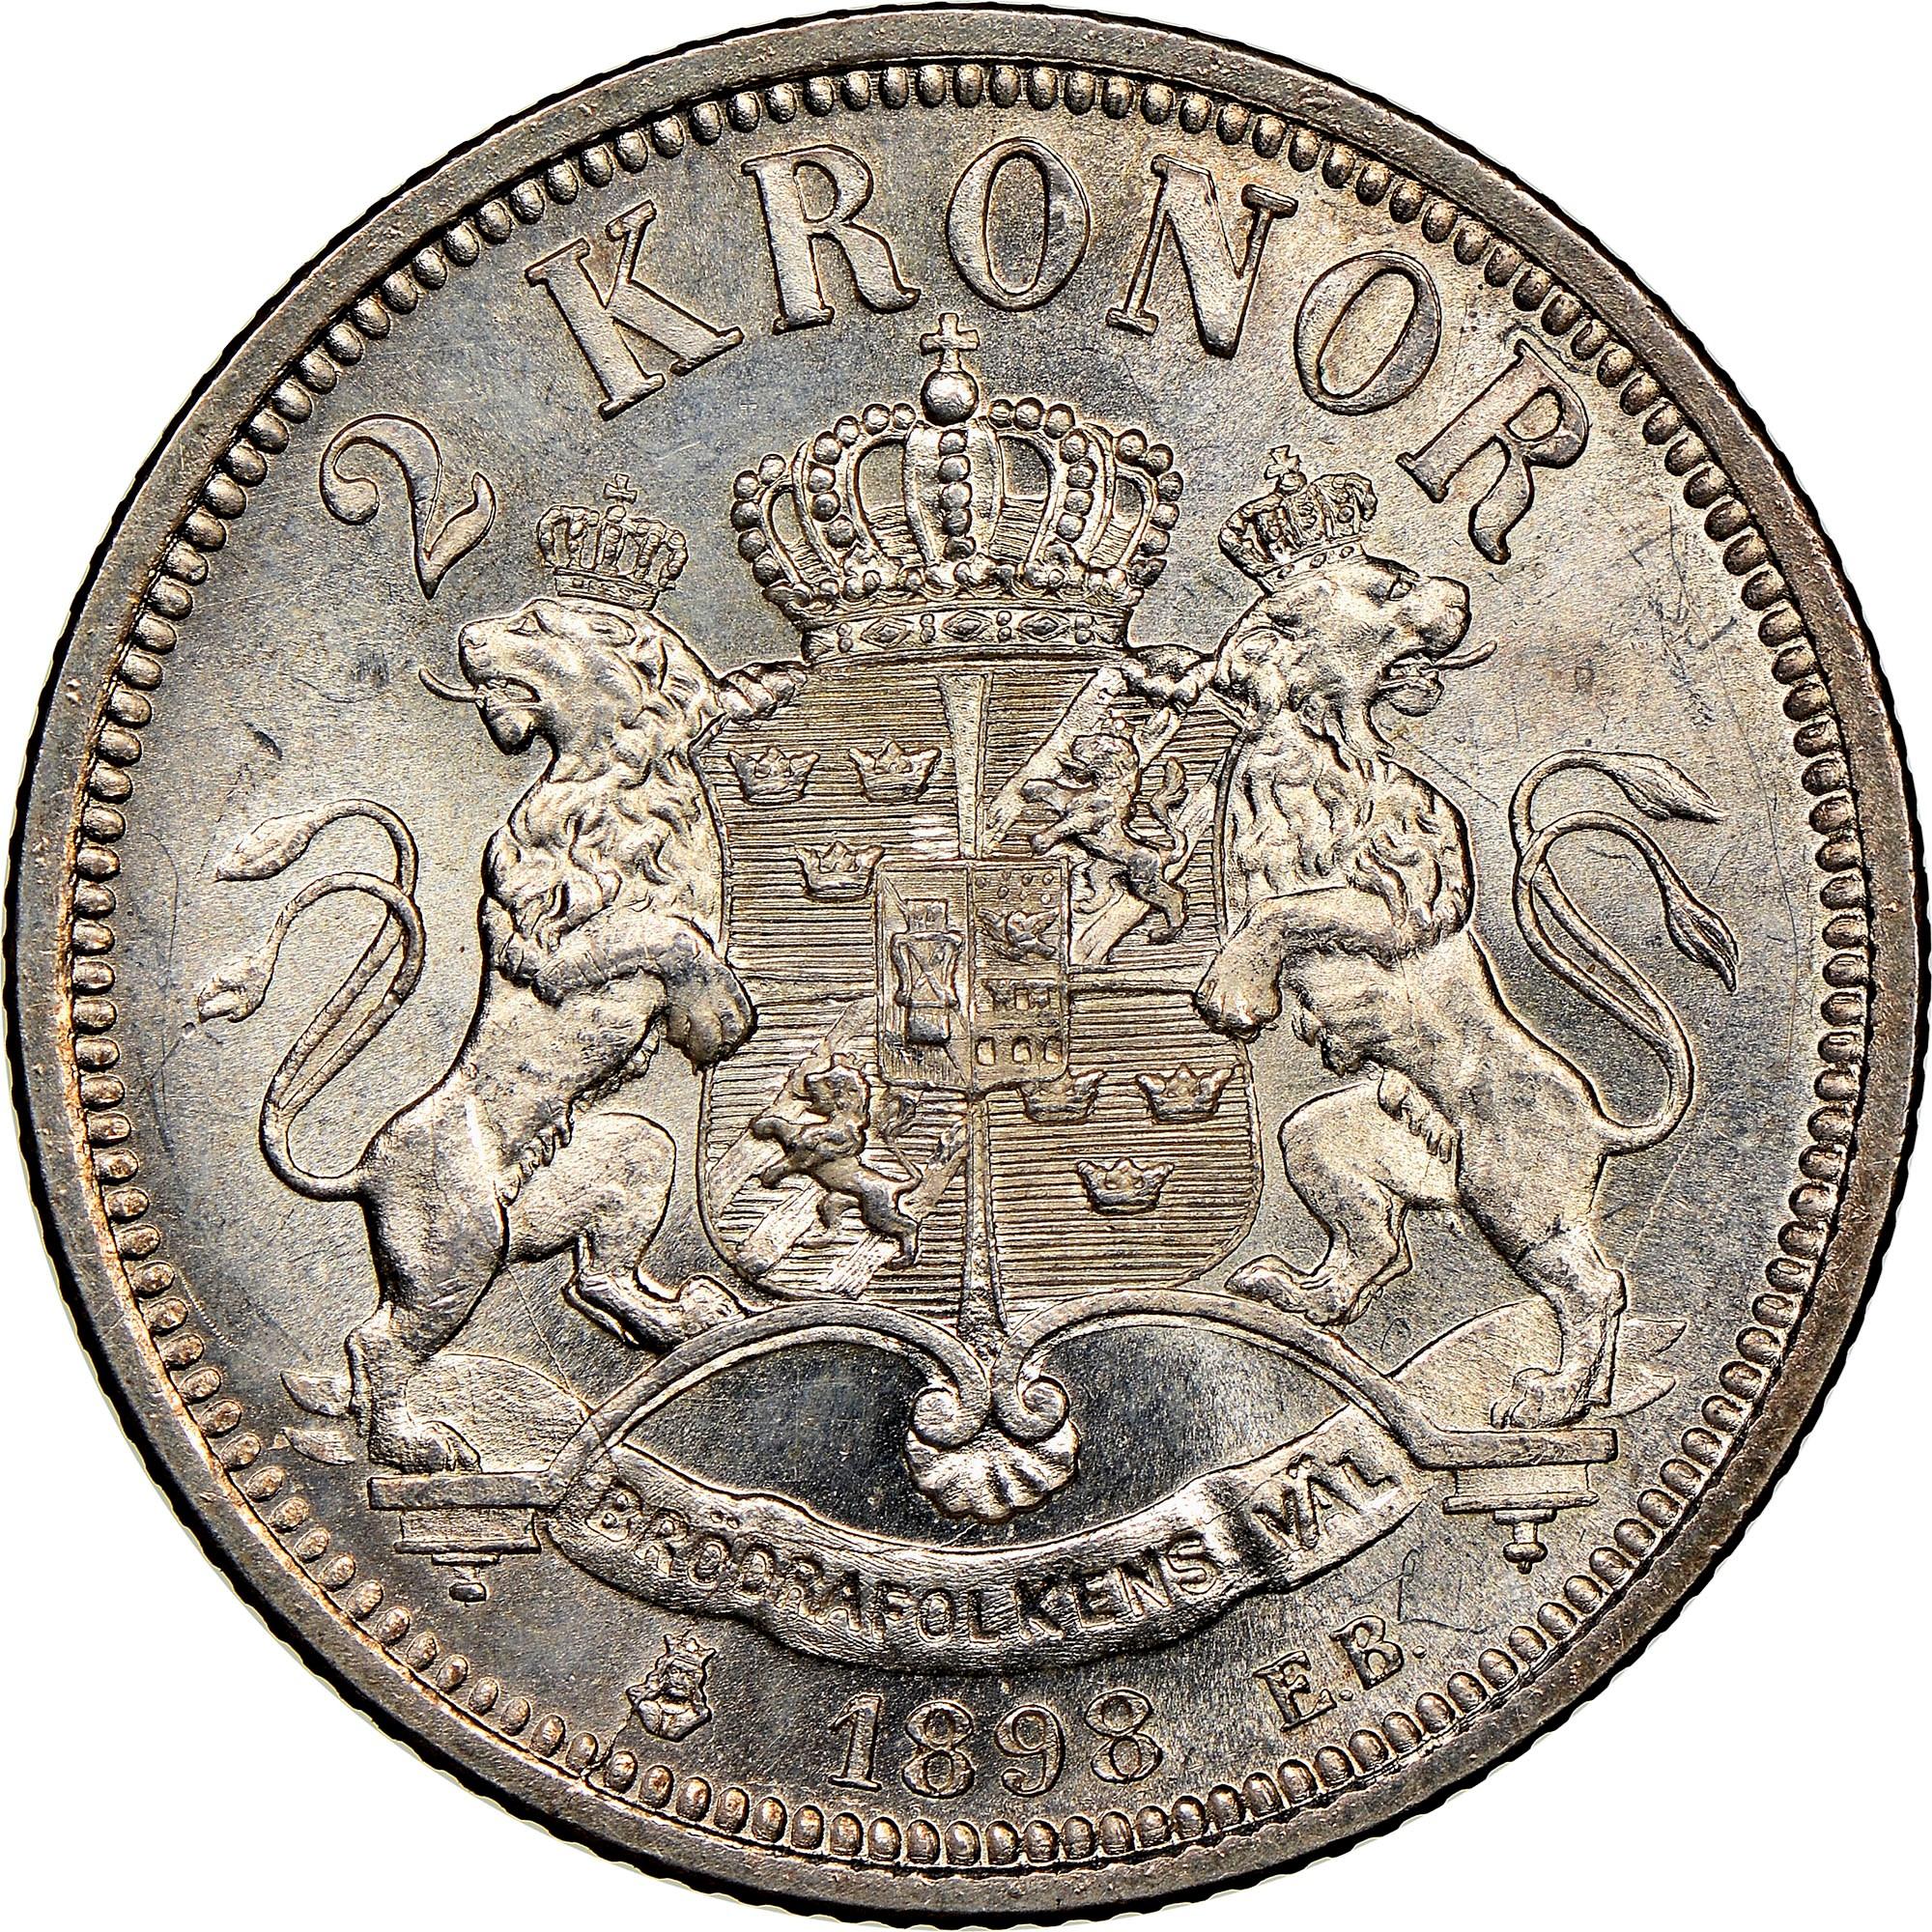 Sweden Krona KM 786.2 Prices & Values | NGC